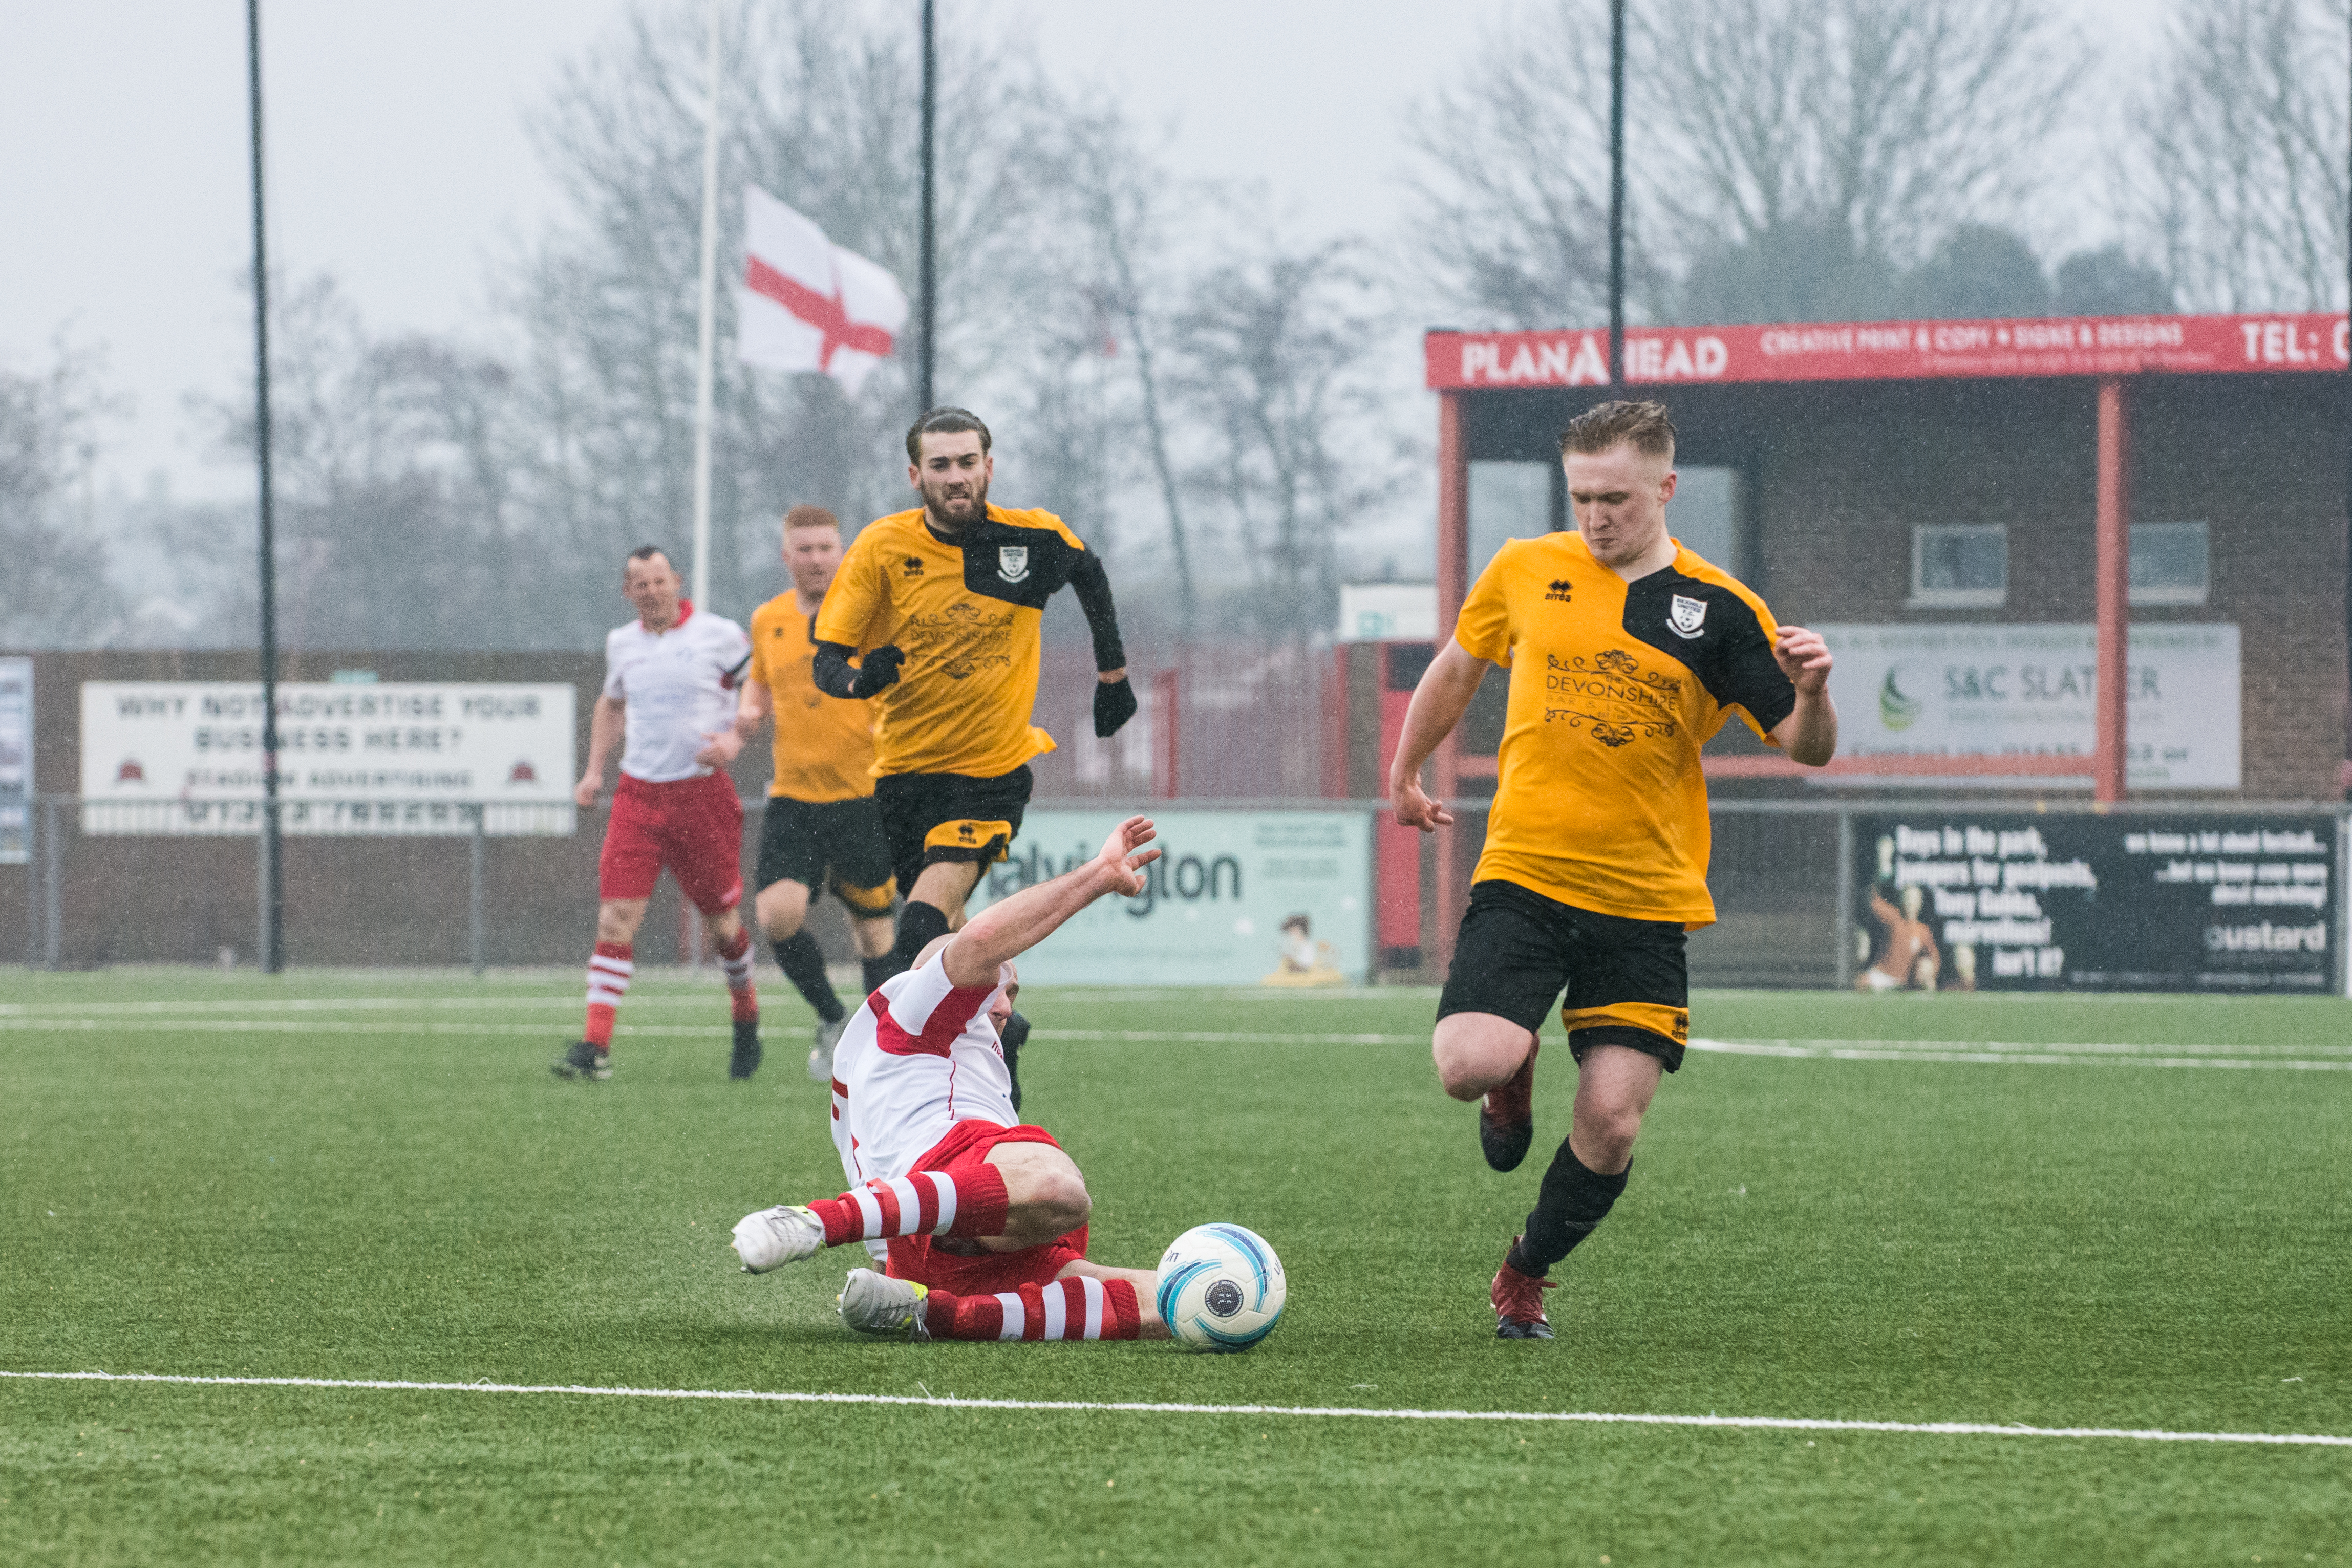 DAVID_JEFFERY Langney Wanderers FC vs Bexhill United FC 03.03.18 89